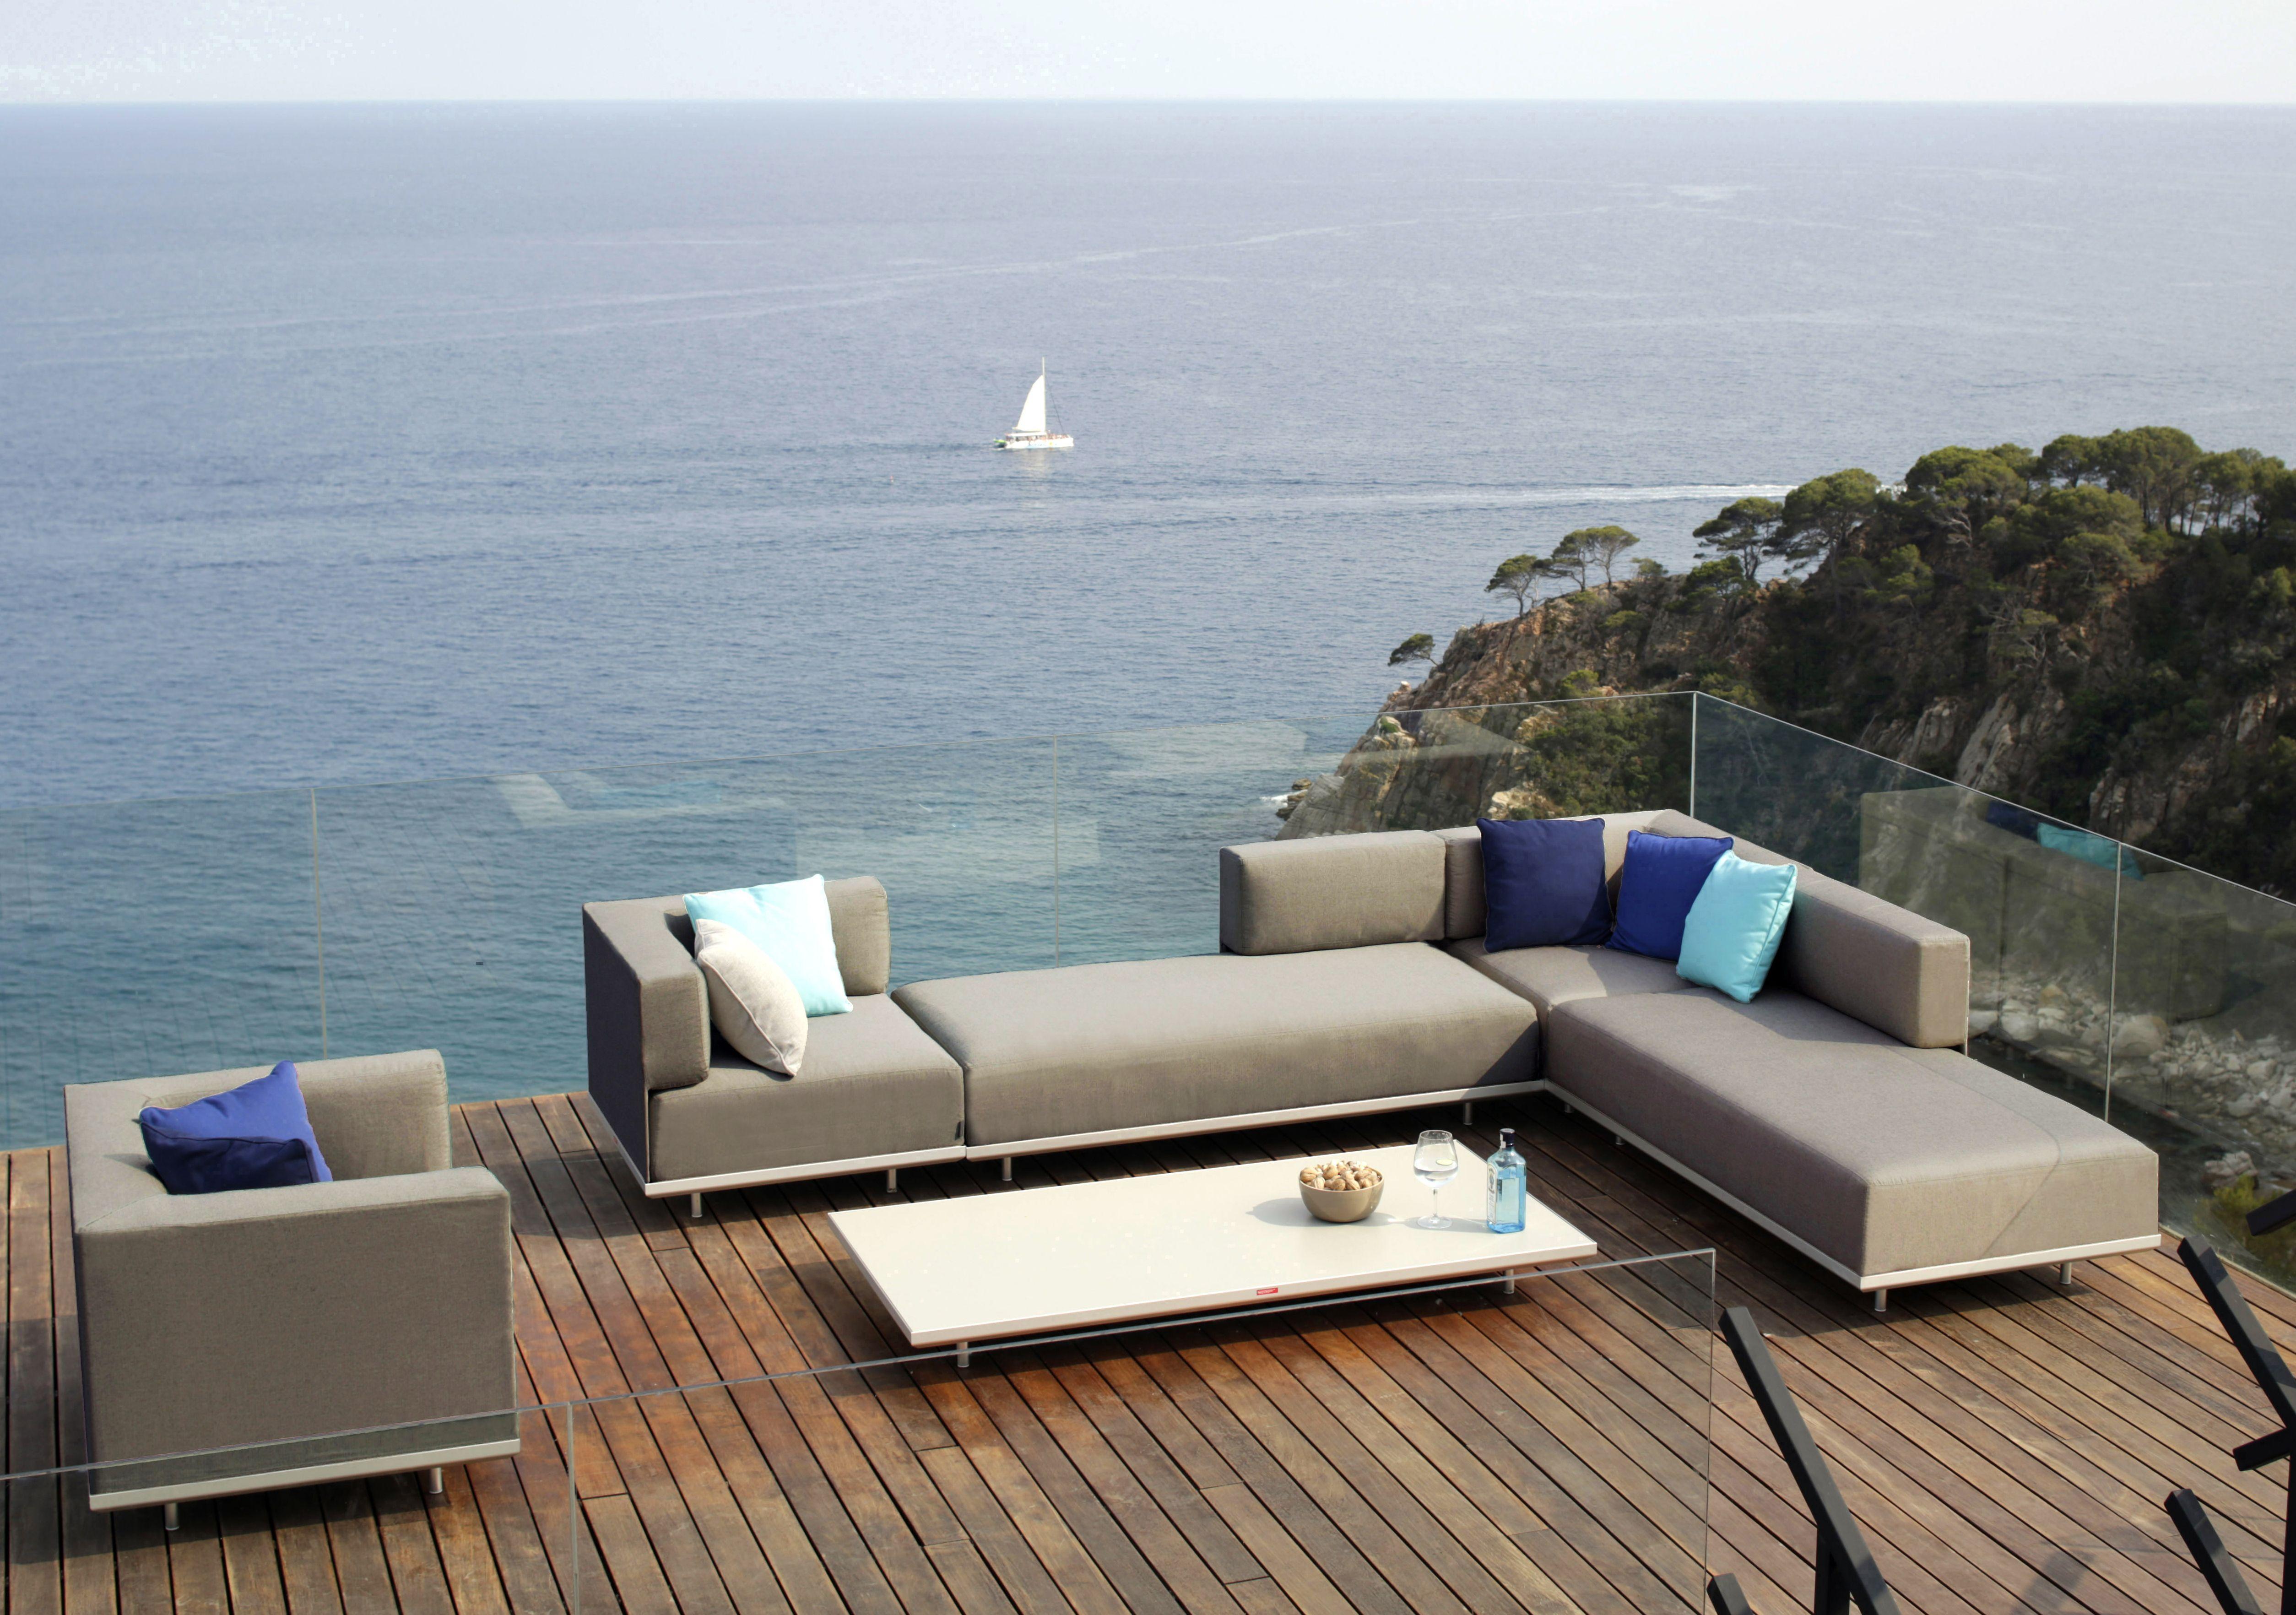 garten lounge ratgeber terrasse pinterest garten lounge lounges und lounge m bel. Black Bedroom Furniture Sets. Home Design Ideas